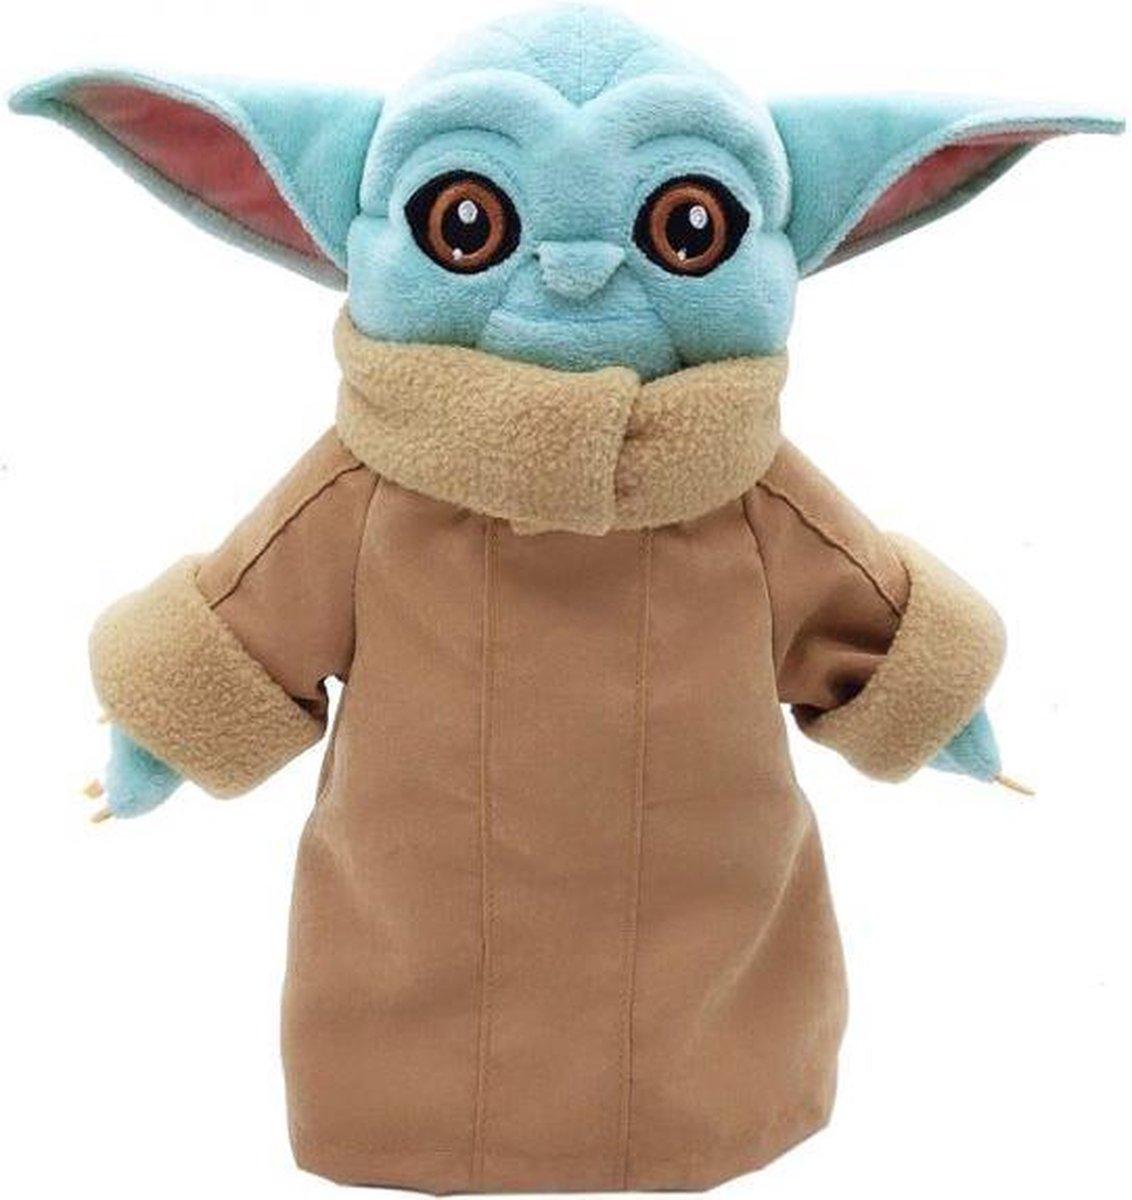 Star Wars Yoda Baby Pluche Knuffel 32 cm Starwars – Mandalorian – The Rise of Skywalker